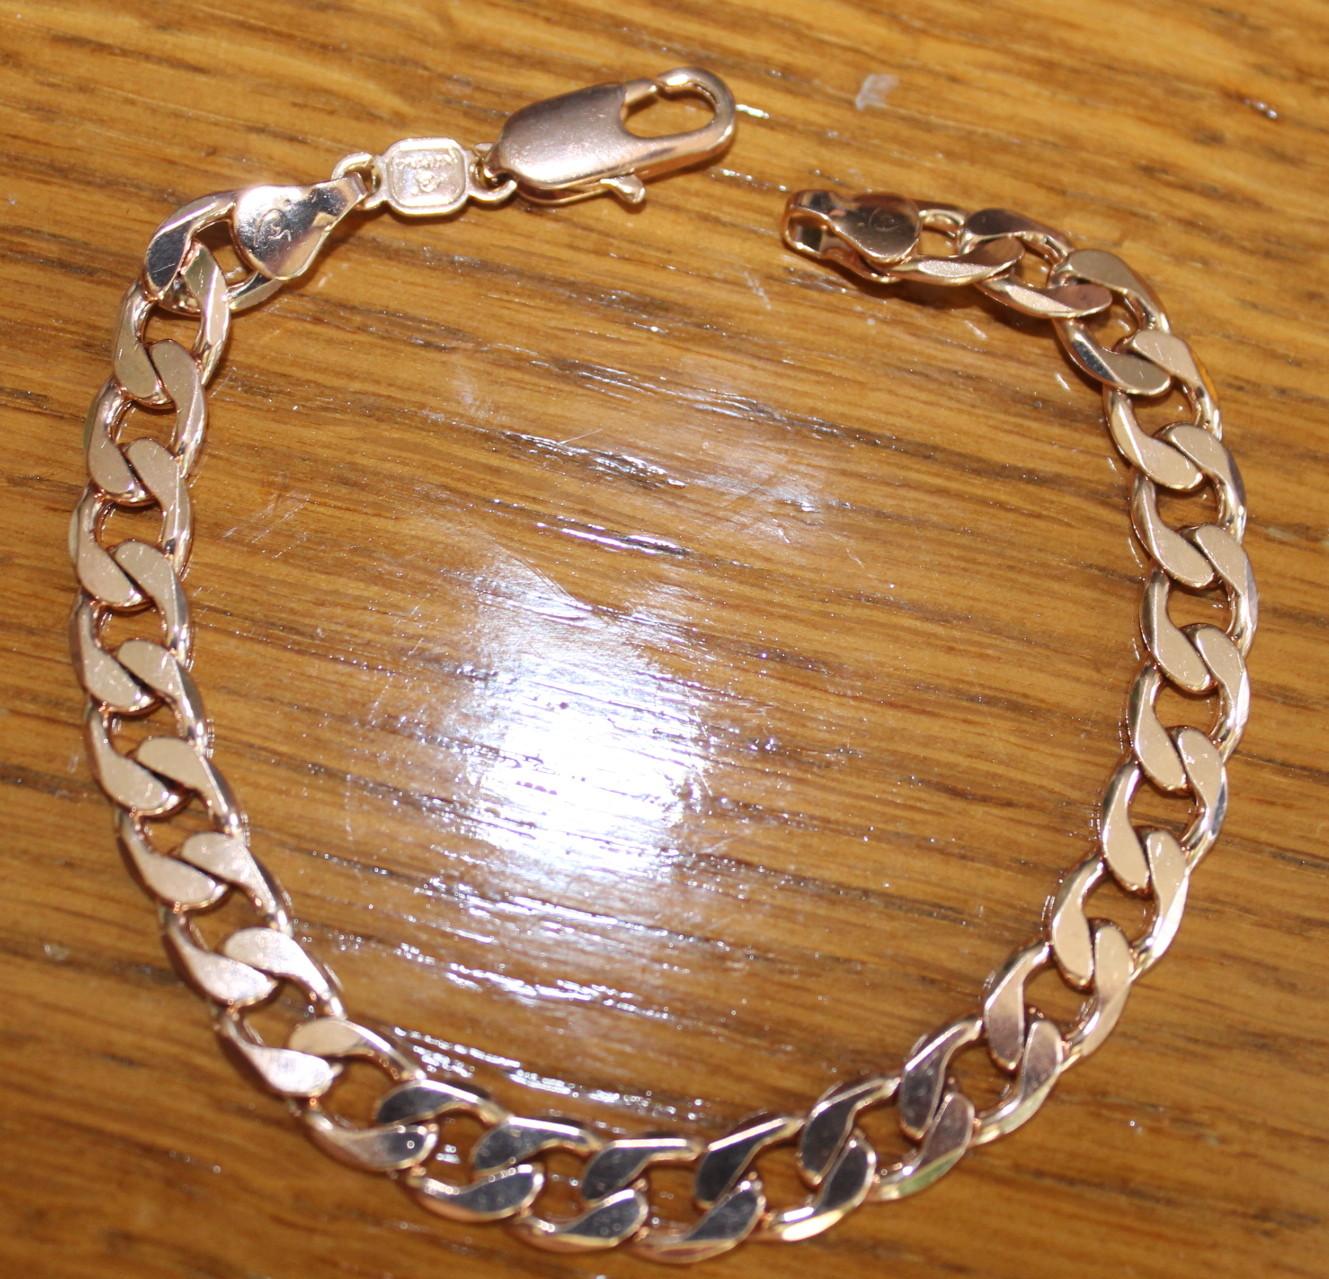 bb7cafa3a8de Pulsera de oro clásica de cadena de moda n2379 – Brazaletes y Sortijas